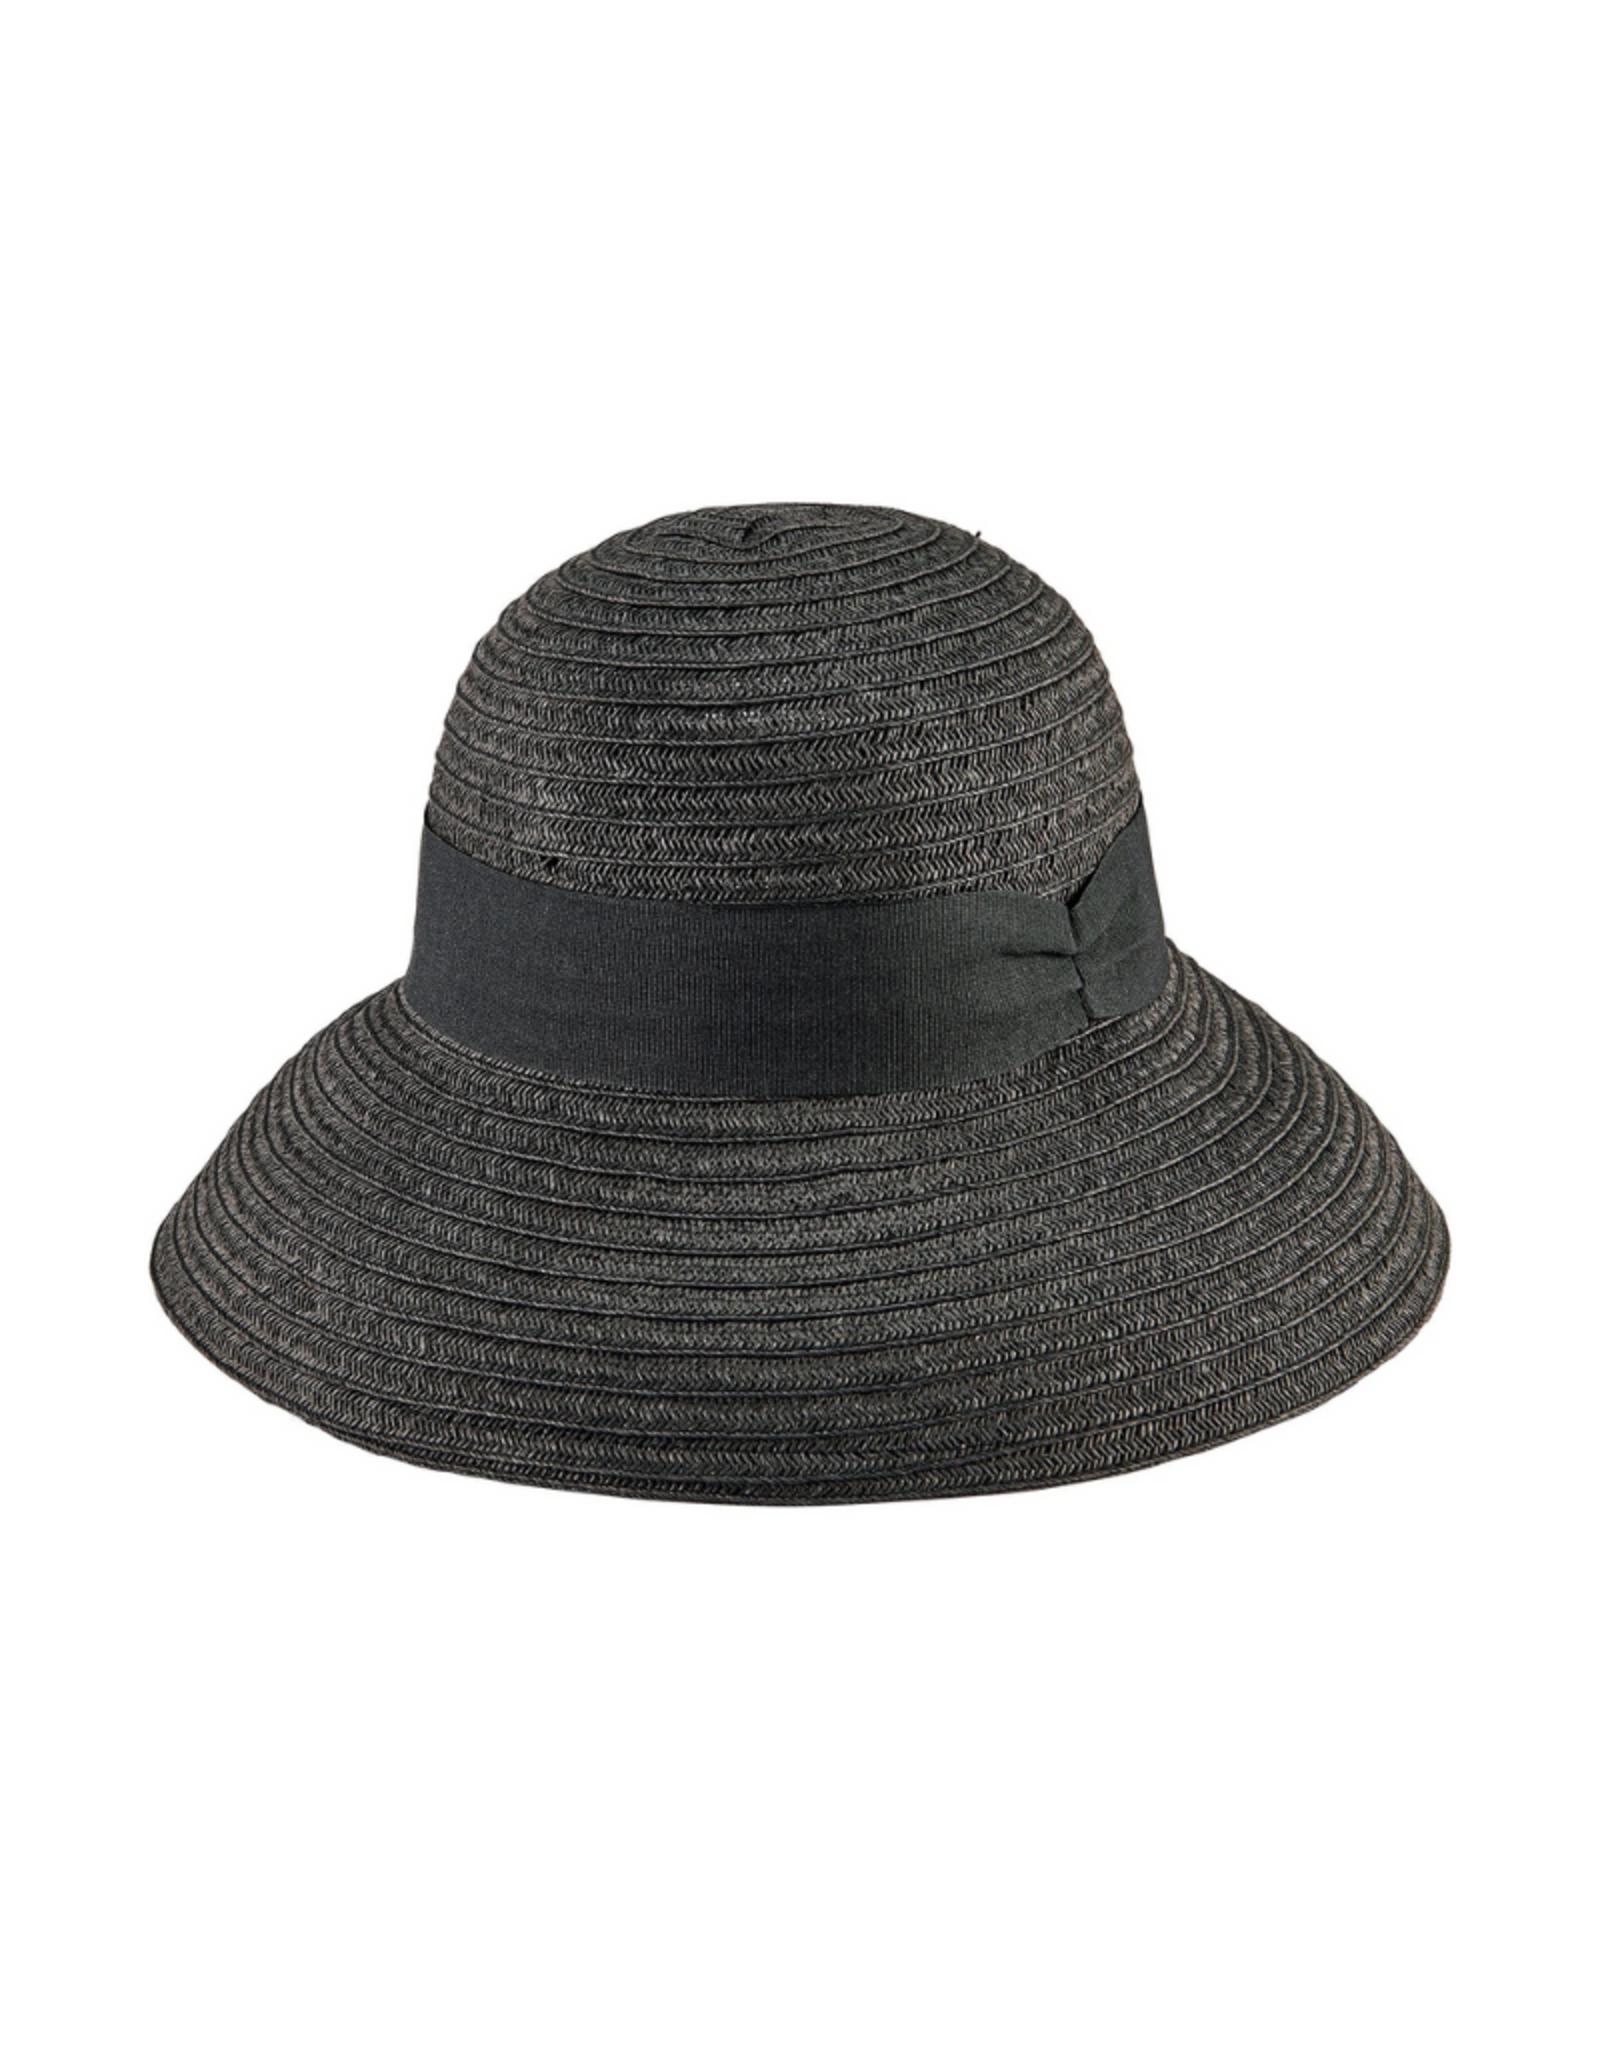 "HAT-CLOCHE W/ GROSGRAIN BAND, 4"" BRIM, PAPER MIX"